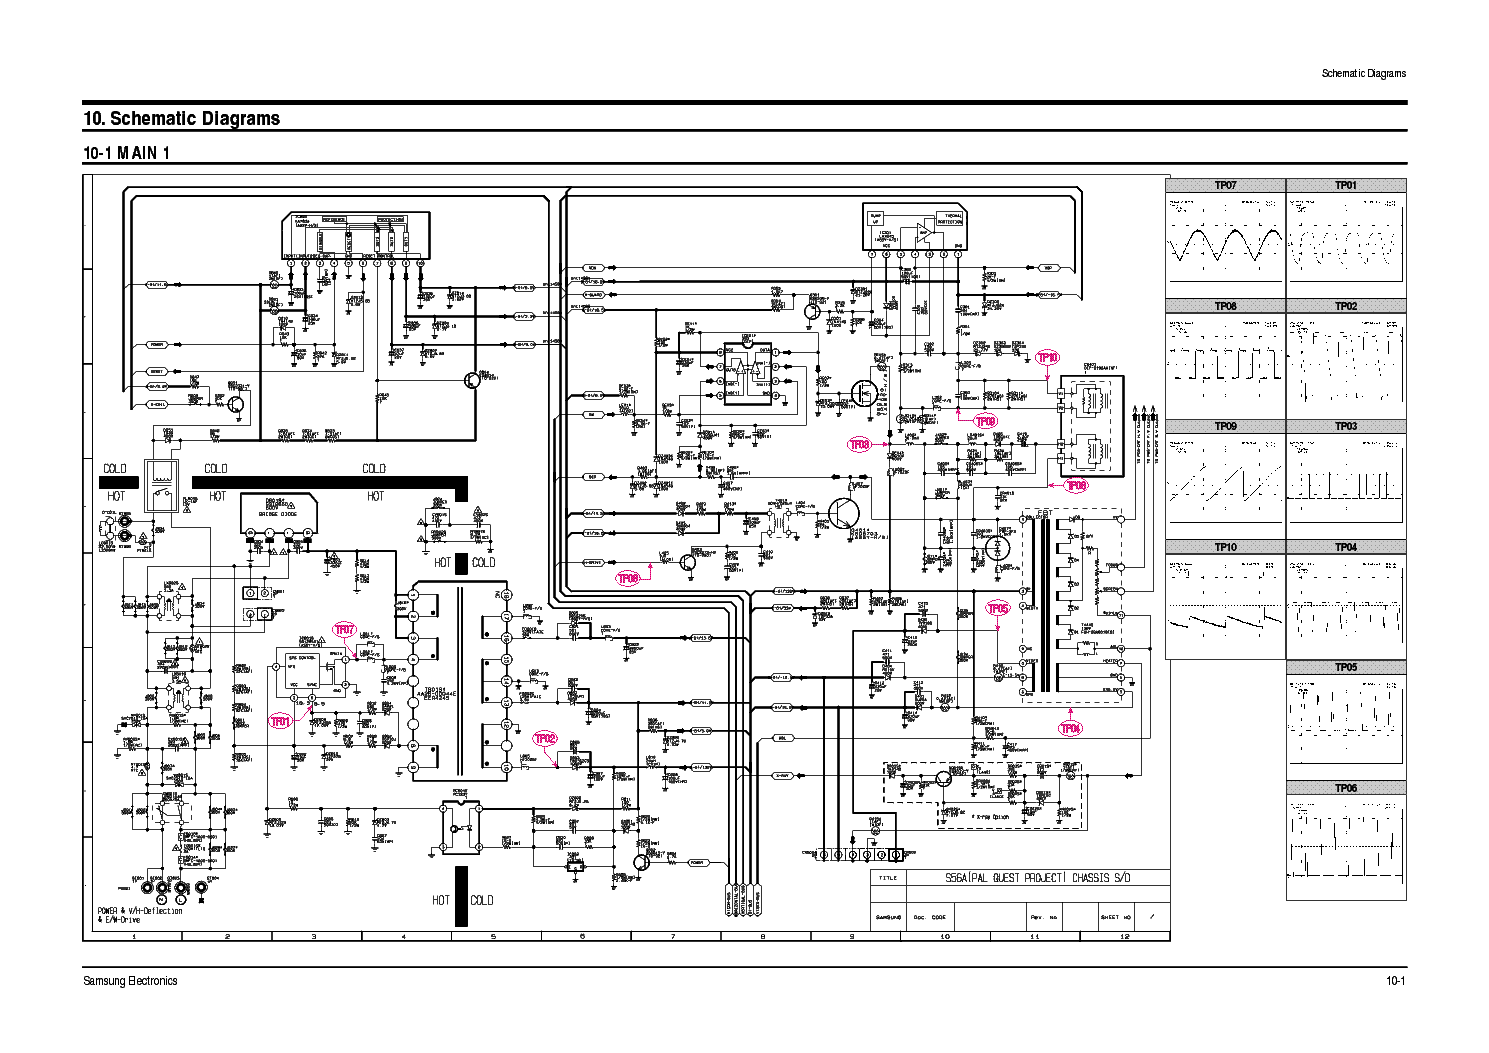 samsung led tv circuit diagram pdf samsung image similiar samsung tv schematics keywords on samsung led tv circuit diagram pdf